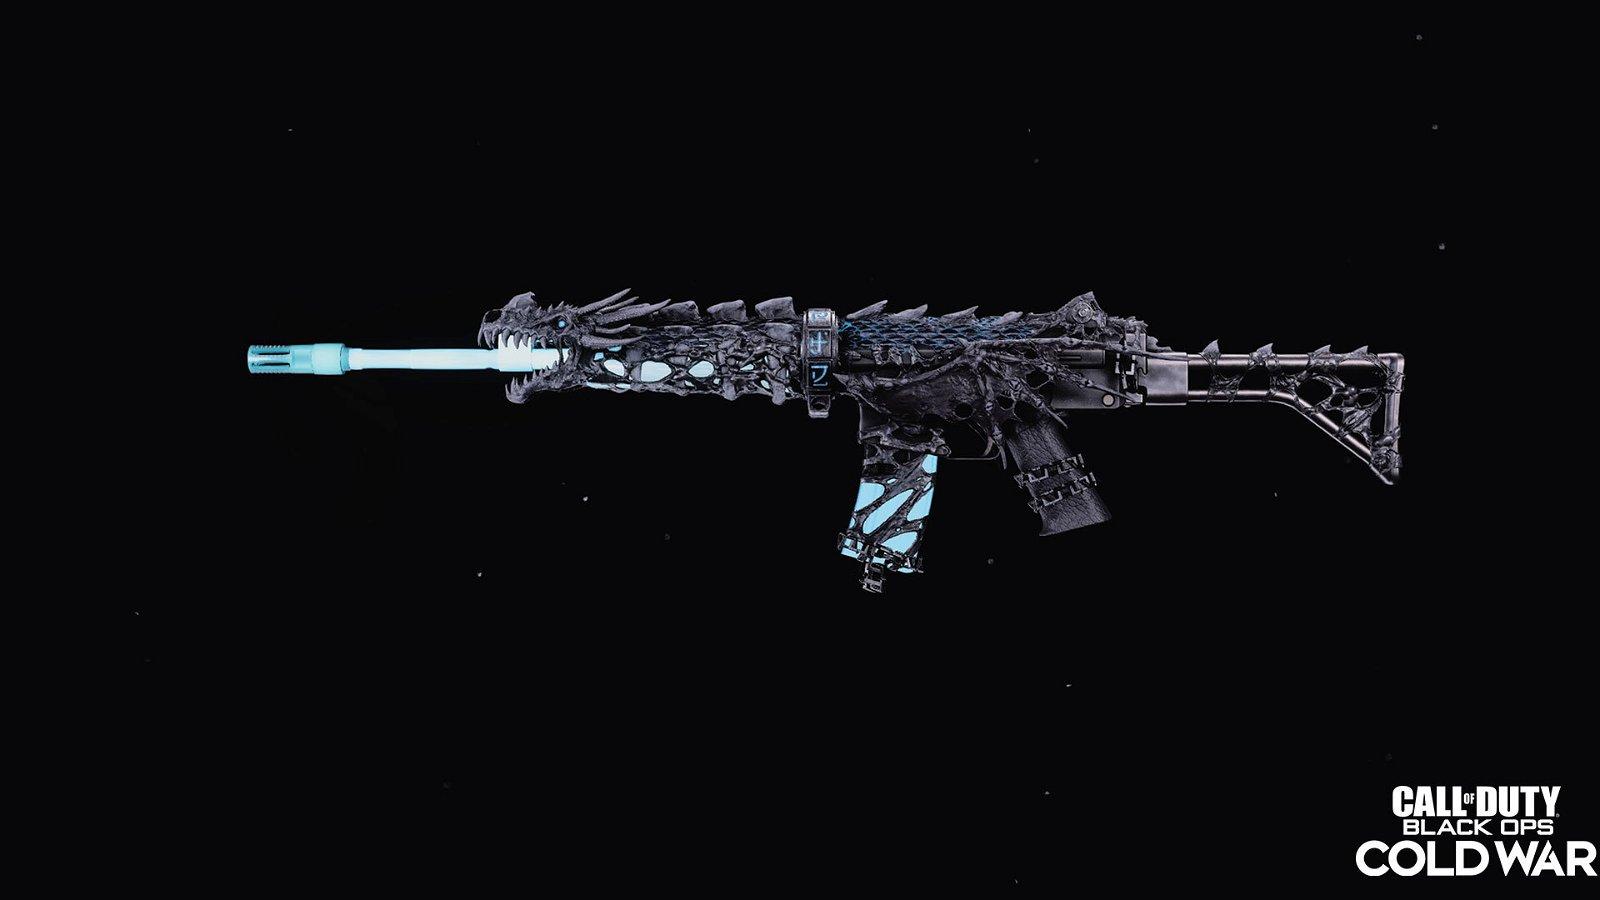 Call Of Duty: Black Ops Cold War Blueprints